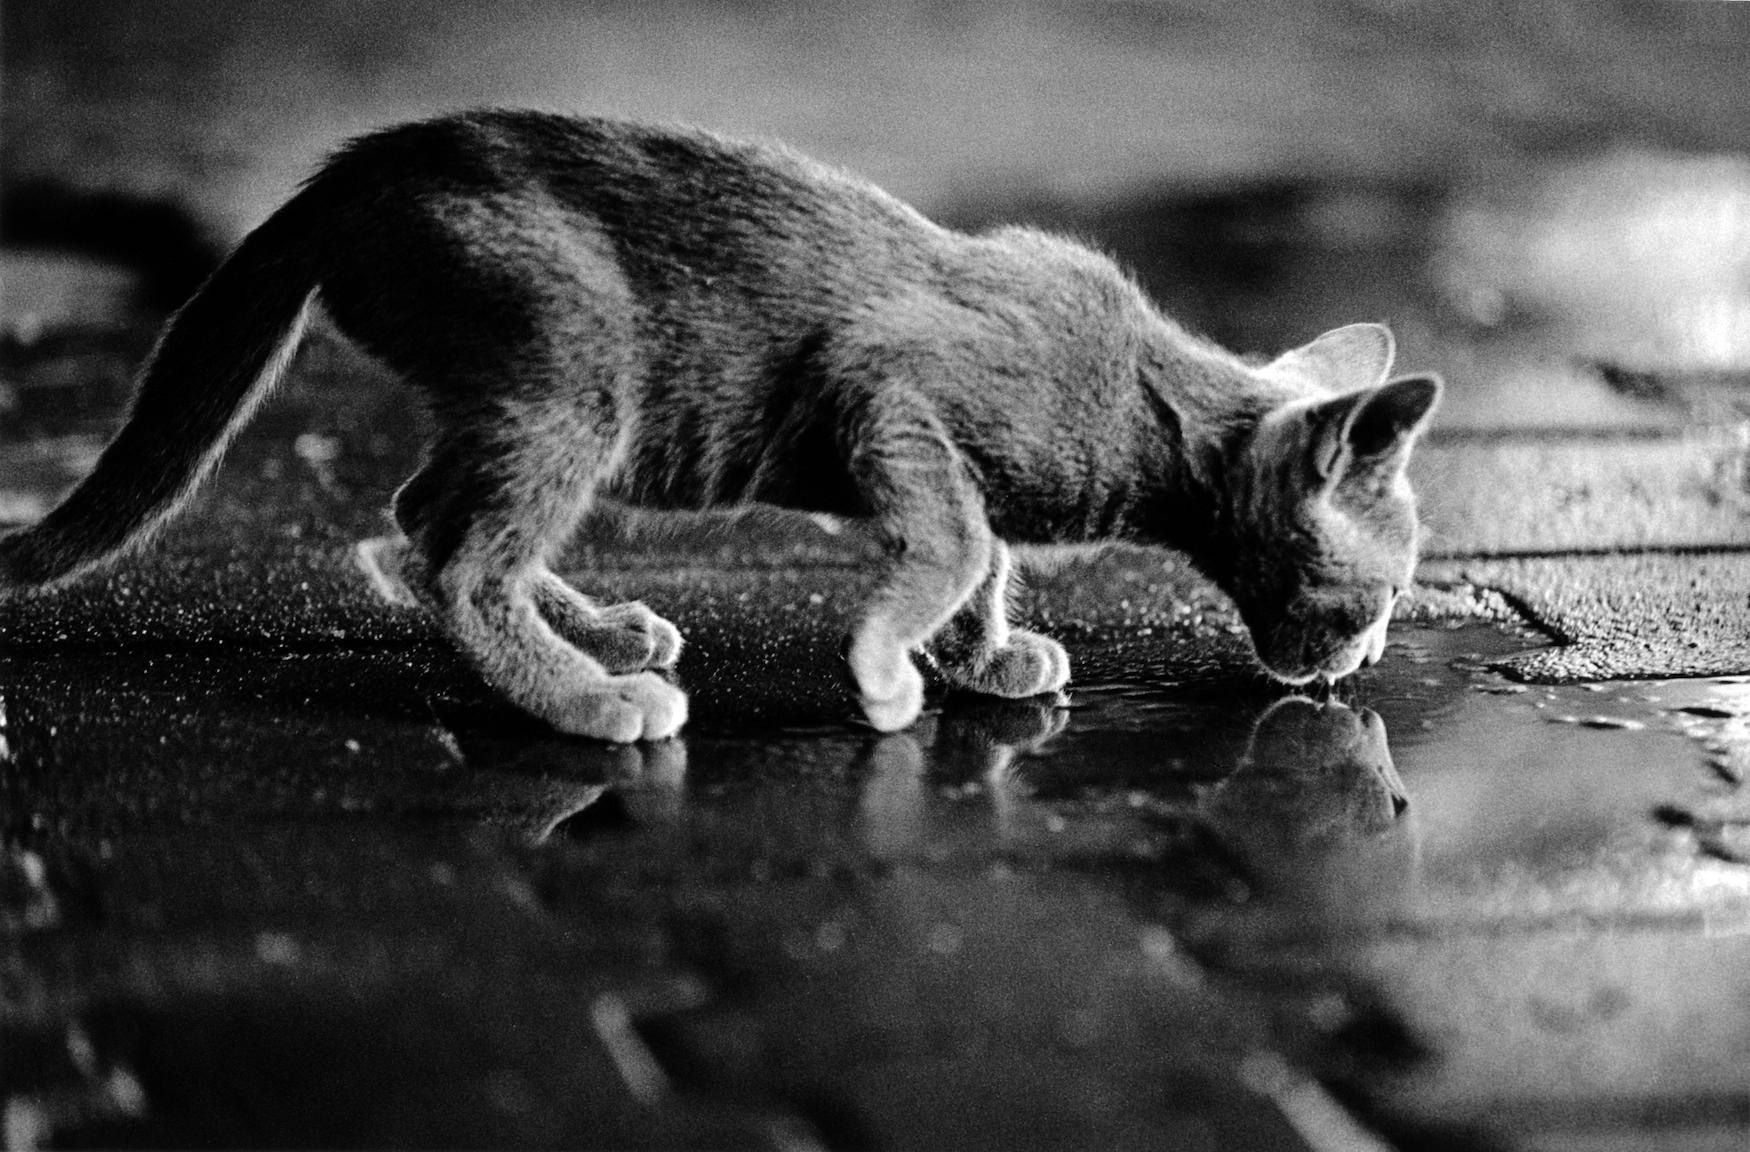 walter_rothwell_photography_cats-019.jpg